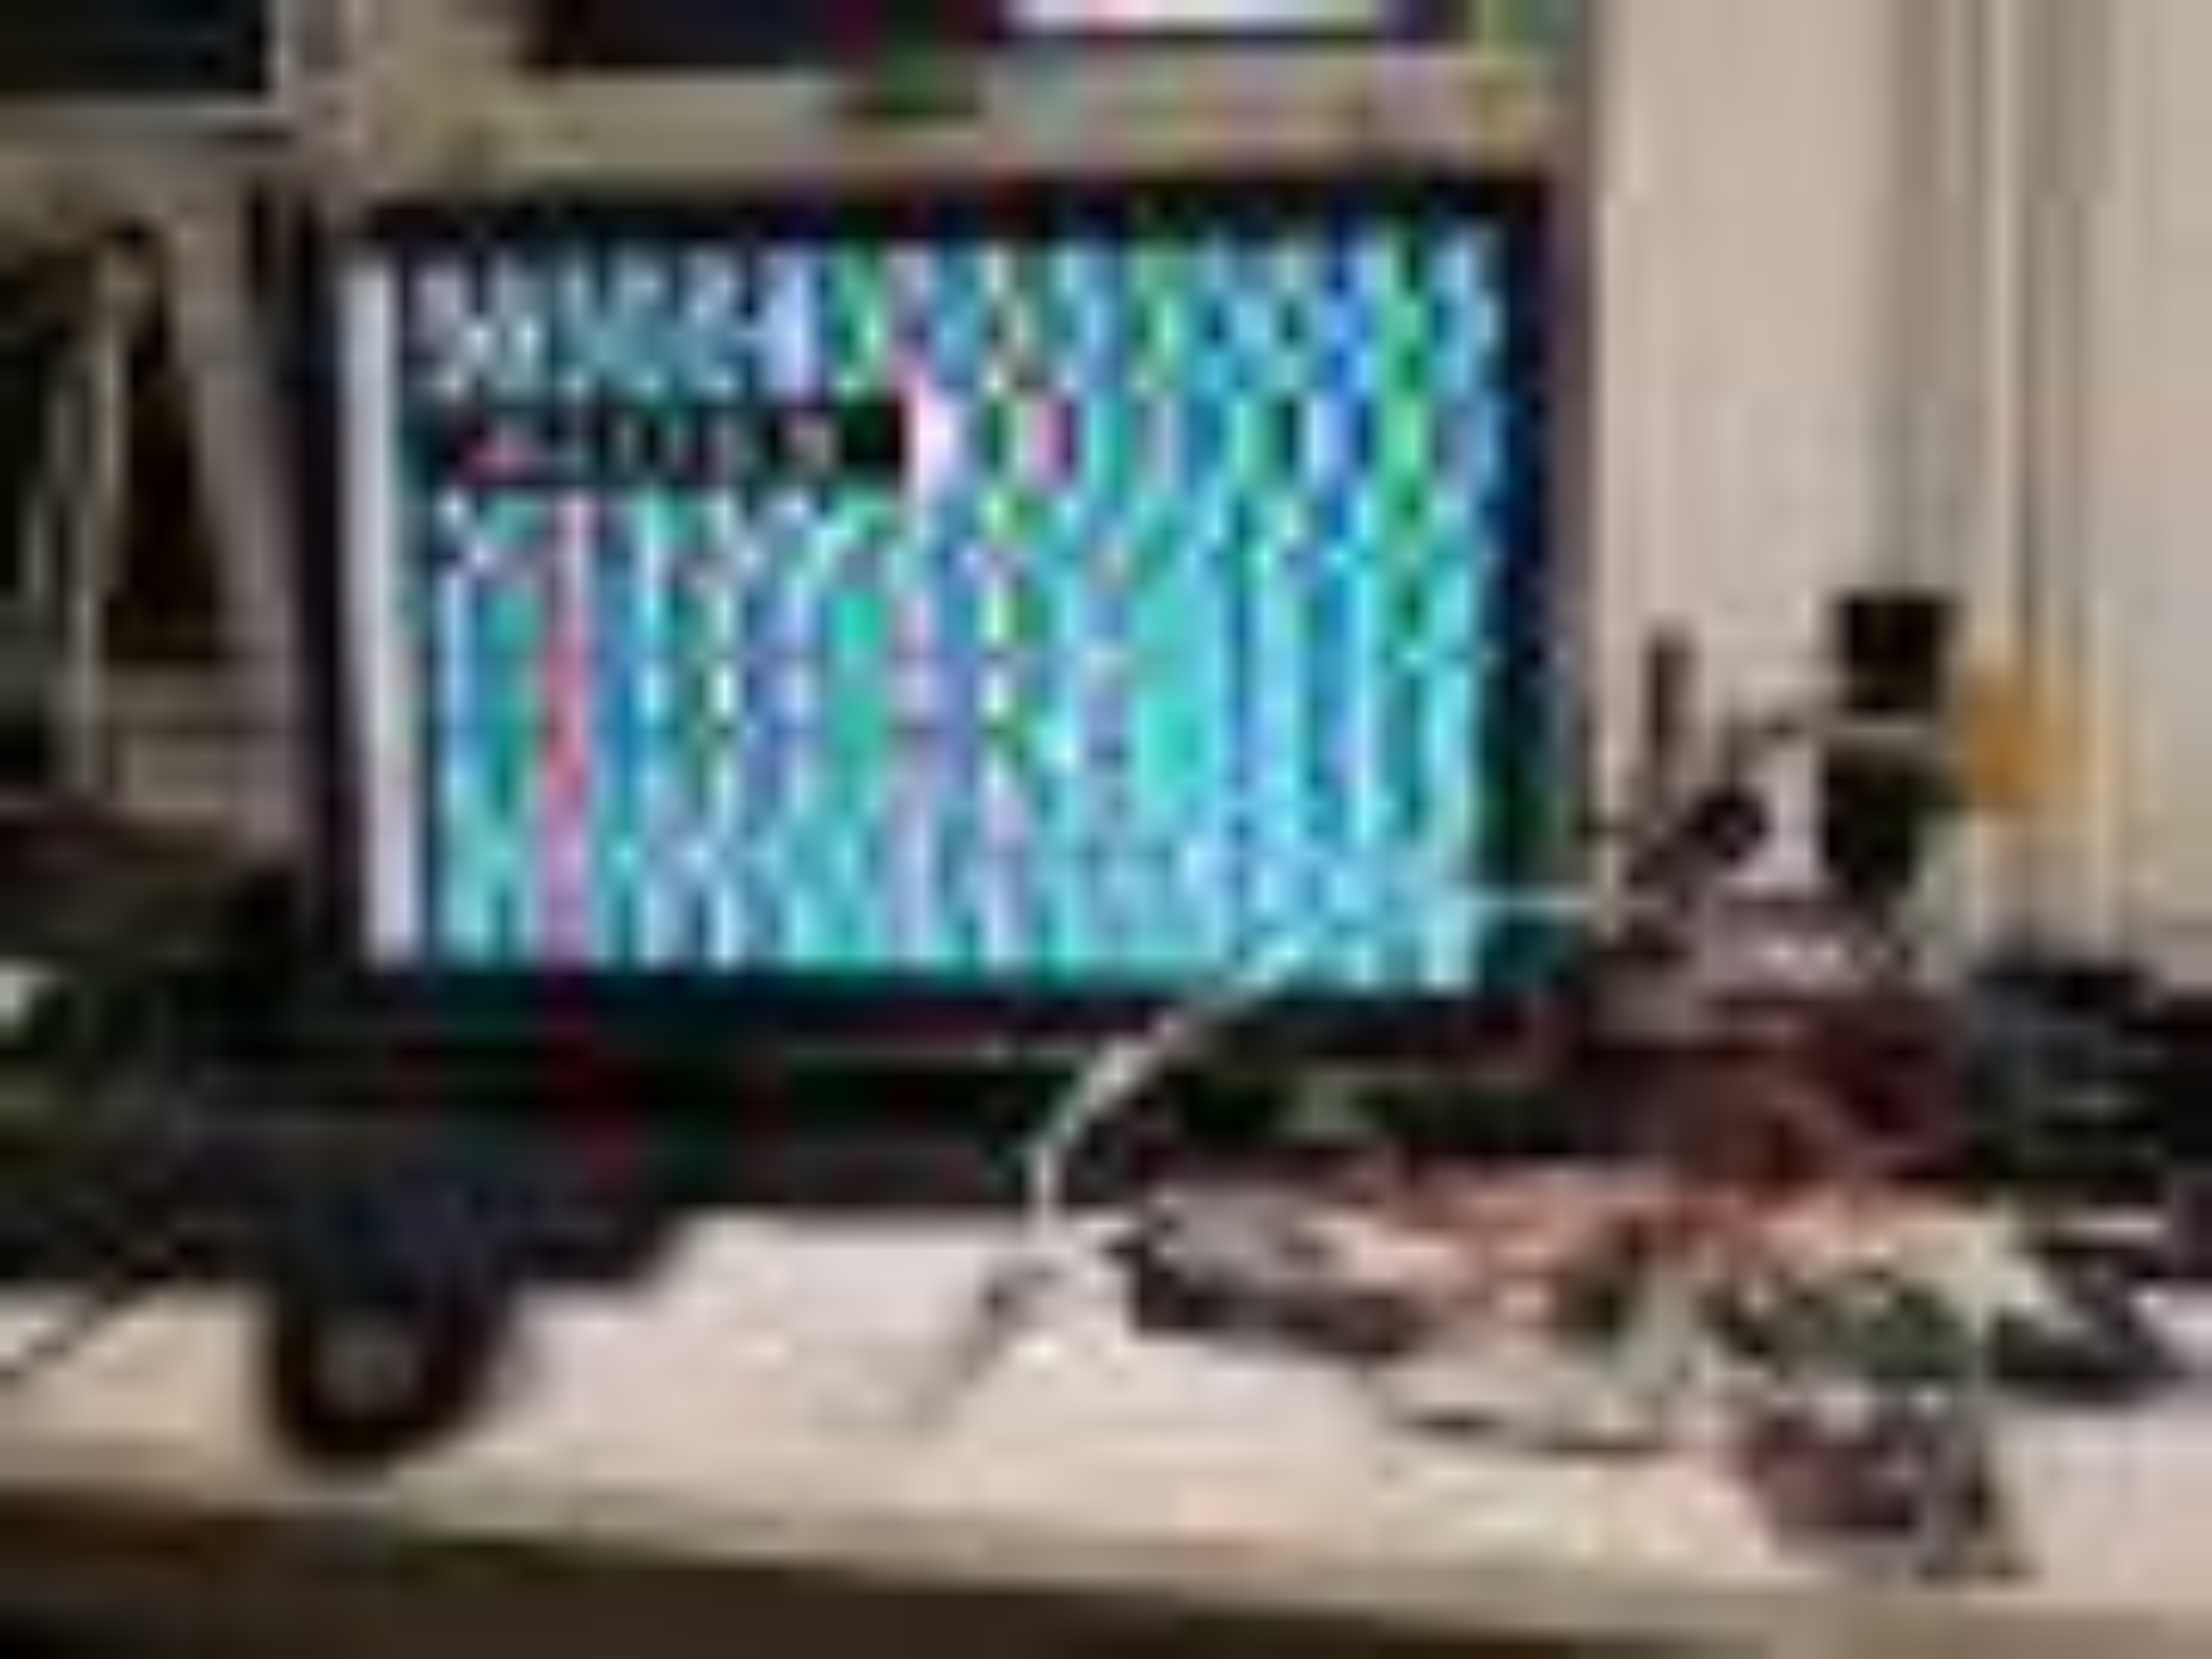 project:videoglitcharray:img_20190822_214826.jpg